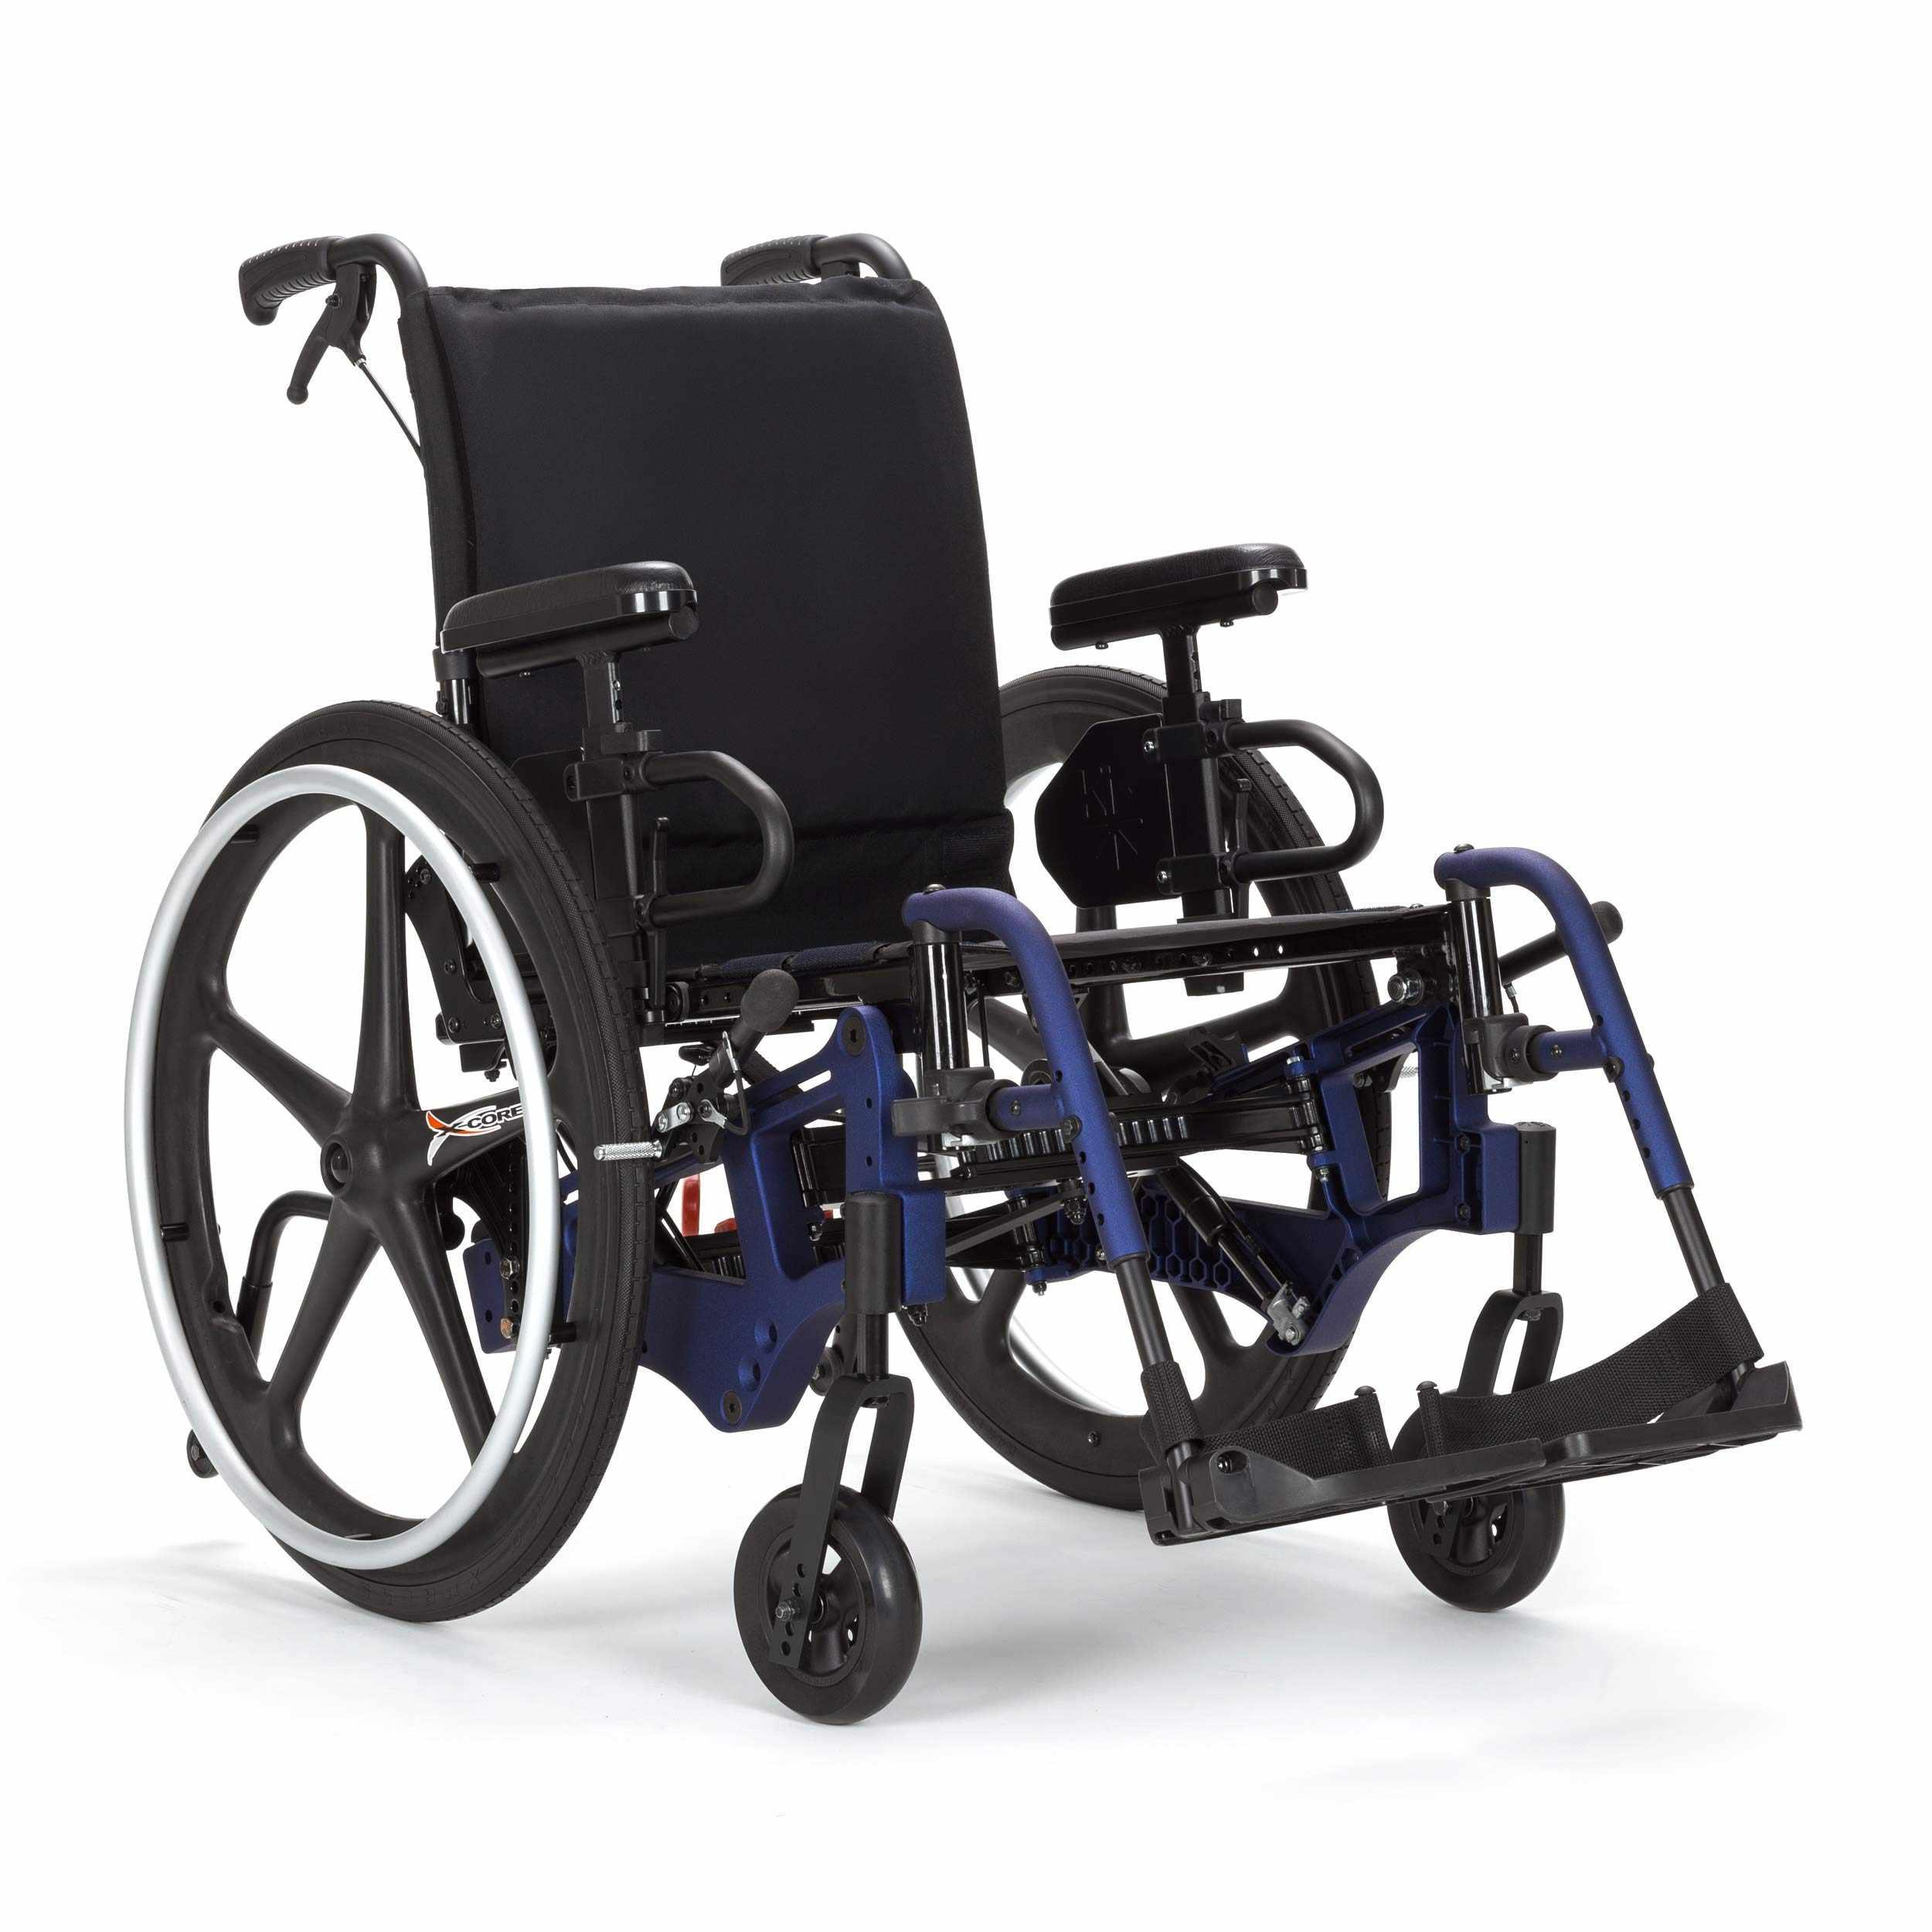 Ki Mobility Liberty FT Basic Tilt Wheelchair